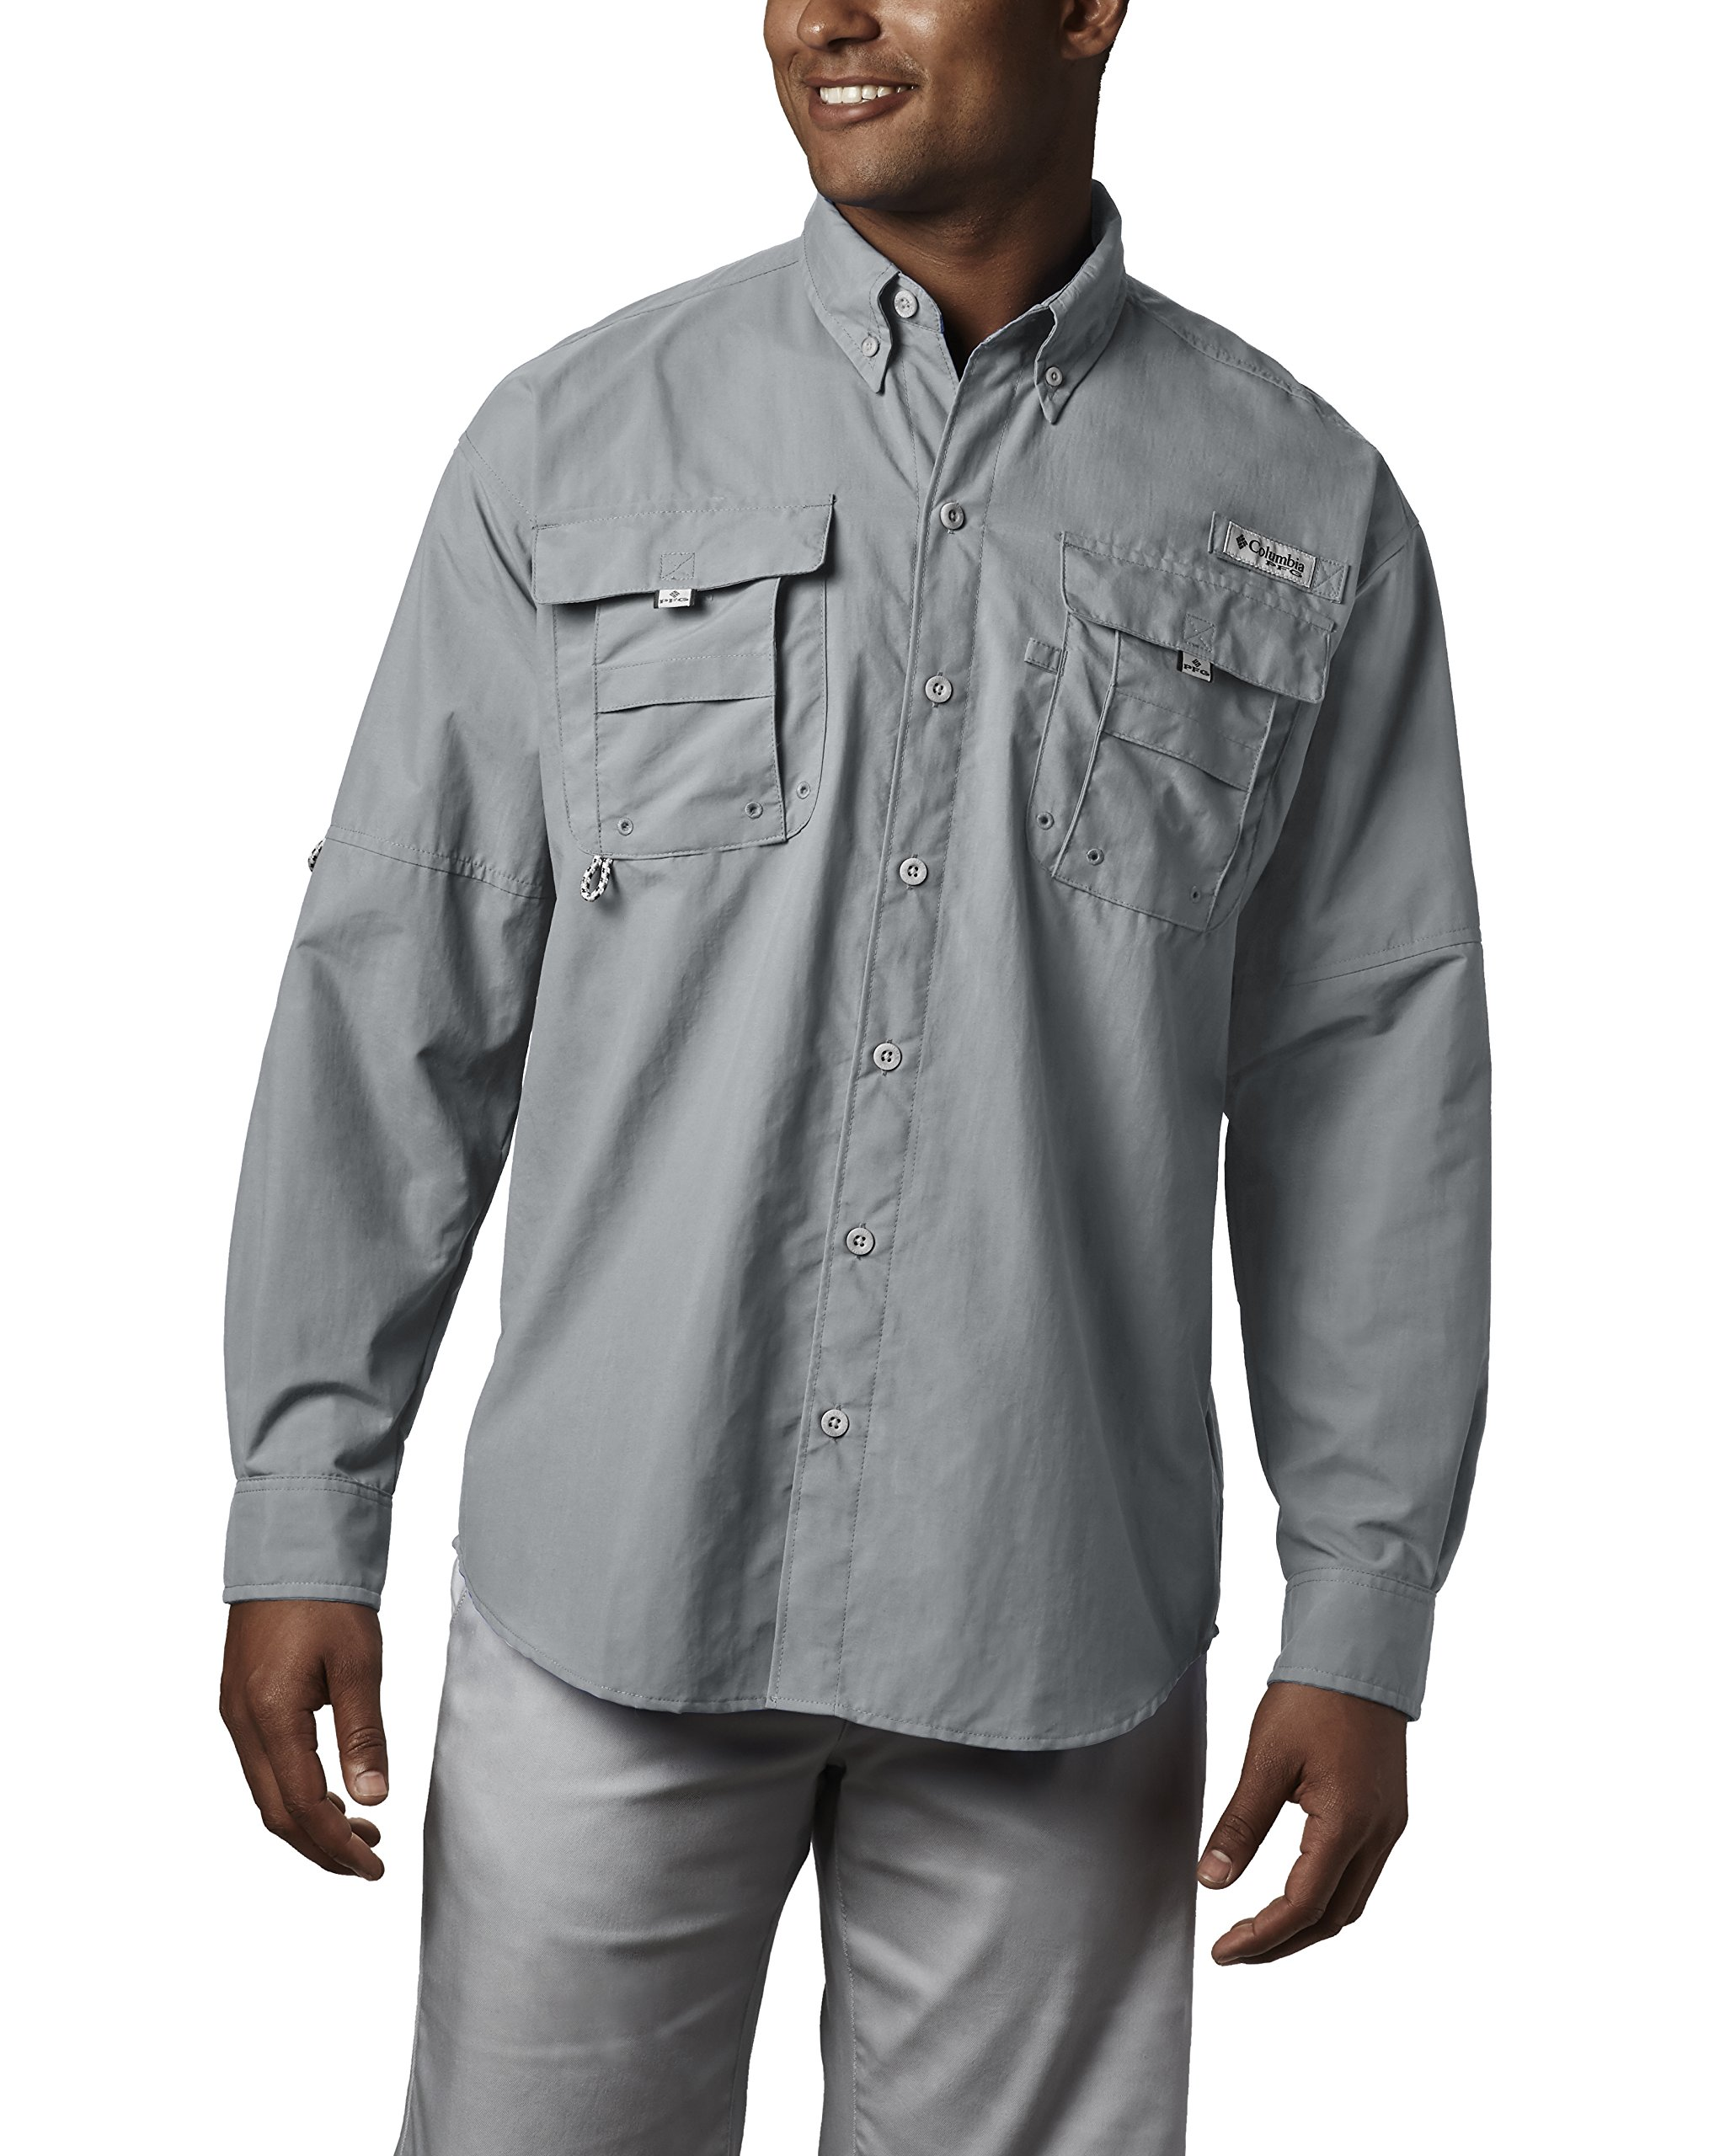 Columbia Men's Bahama II Long Sleeve Shirt, Cool Grey, X-Large